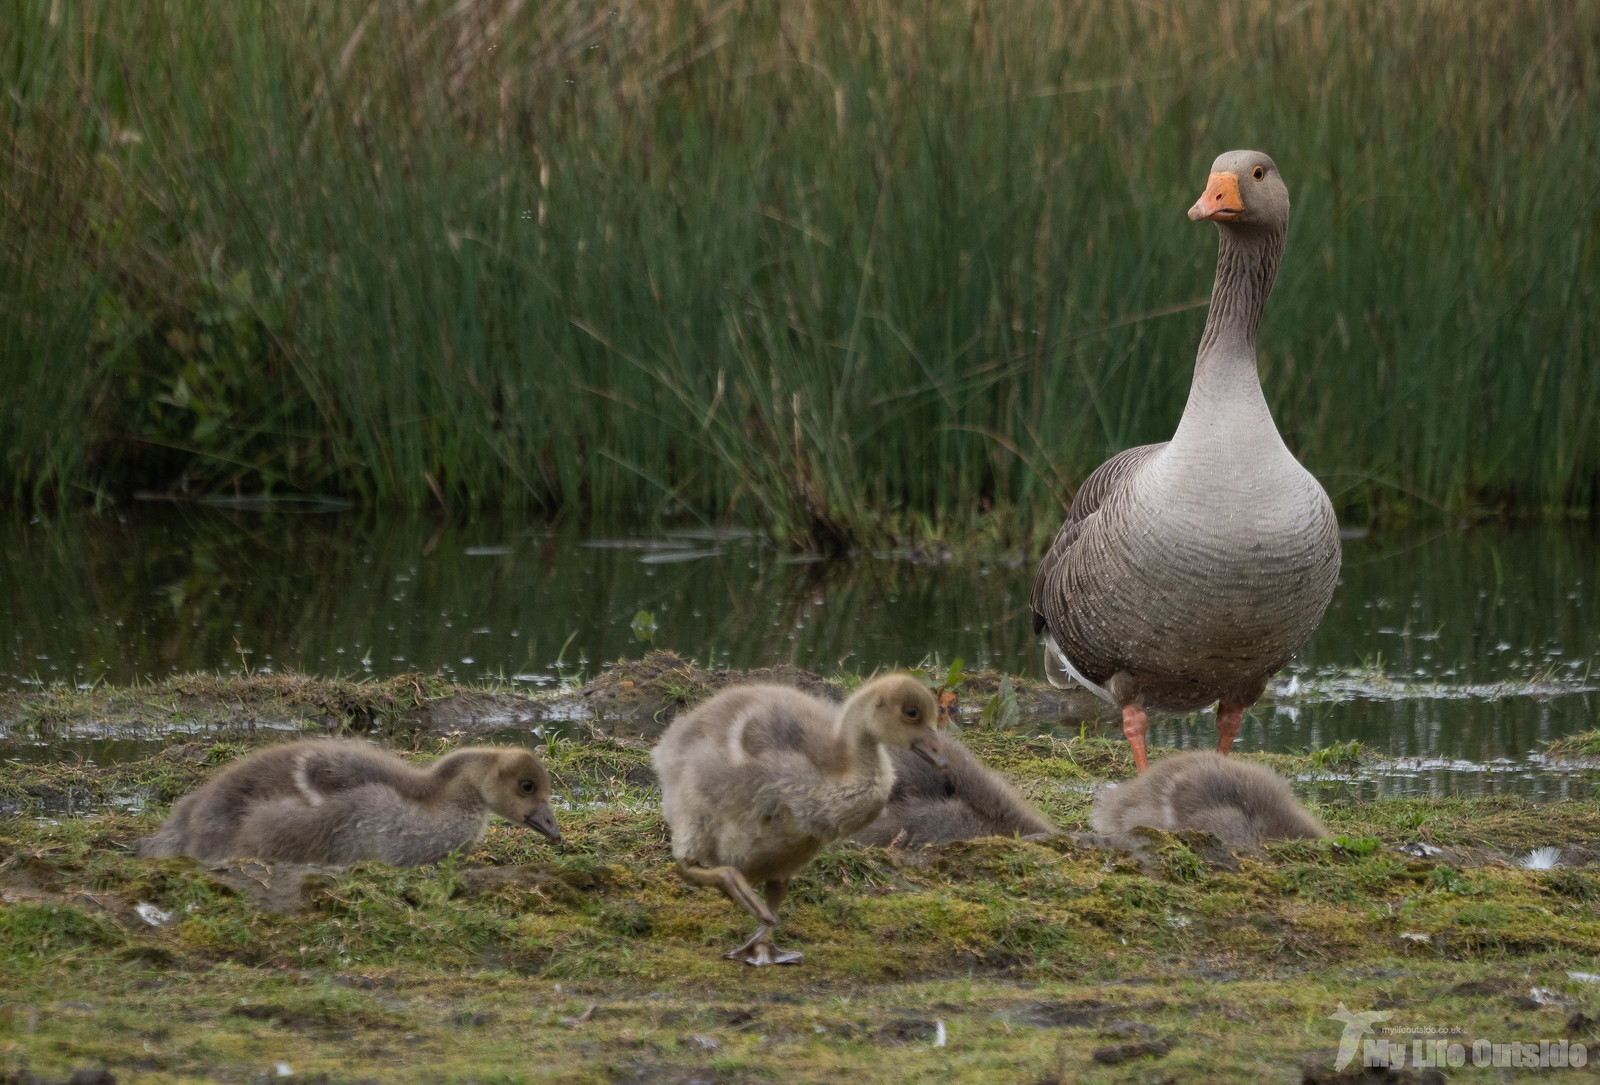 P5141985 - Greylag Goose, St Aidan's